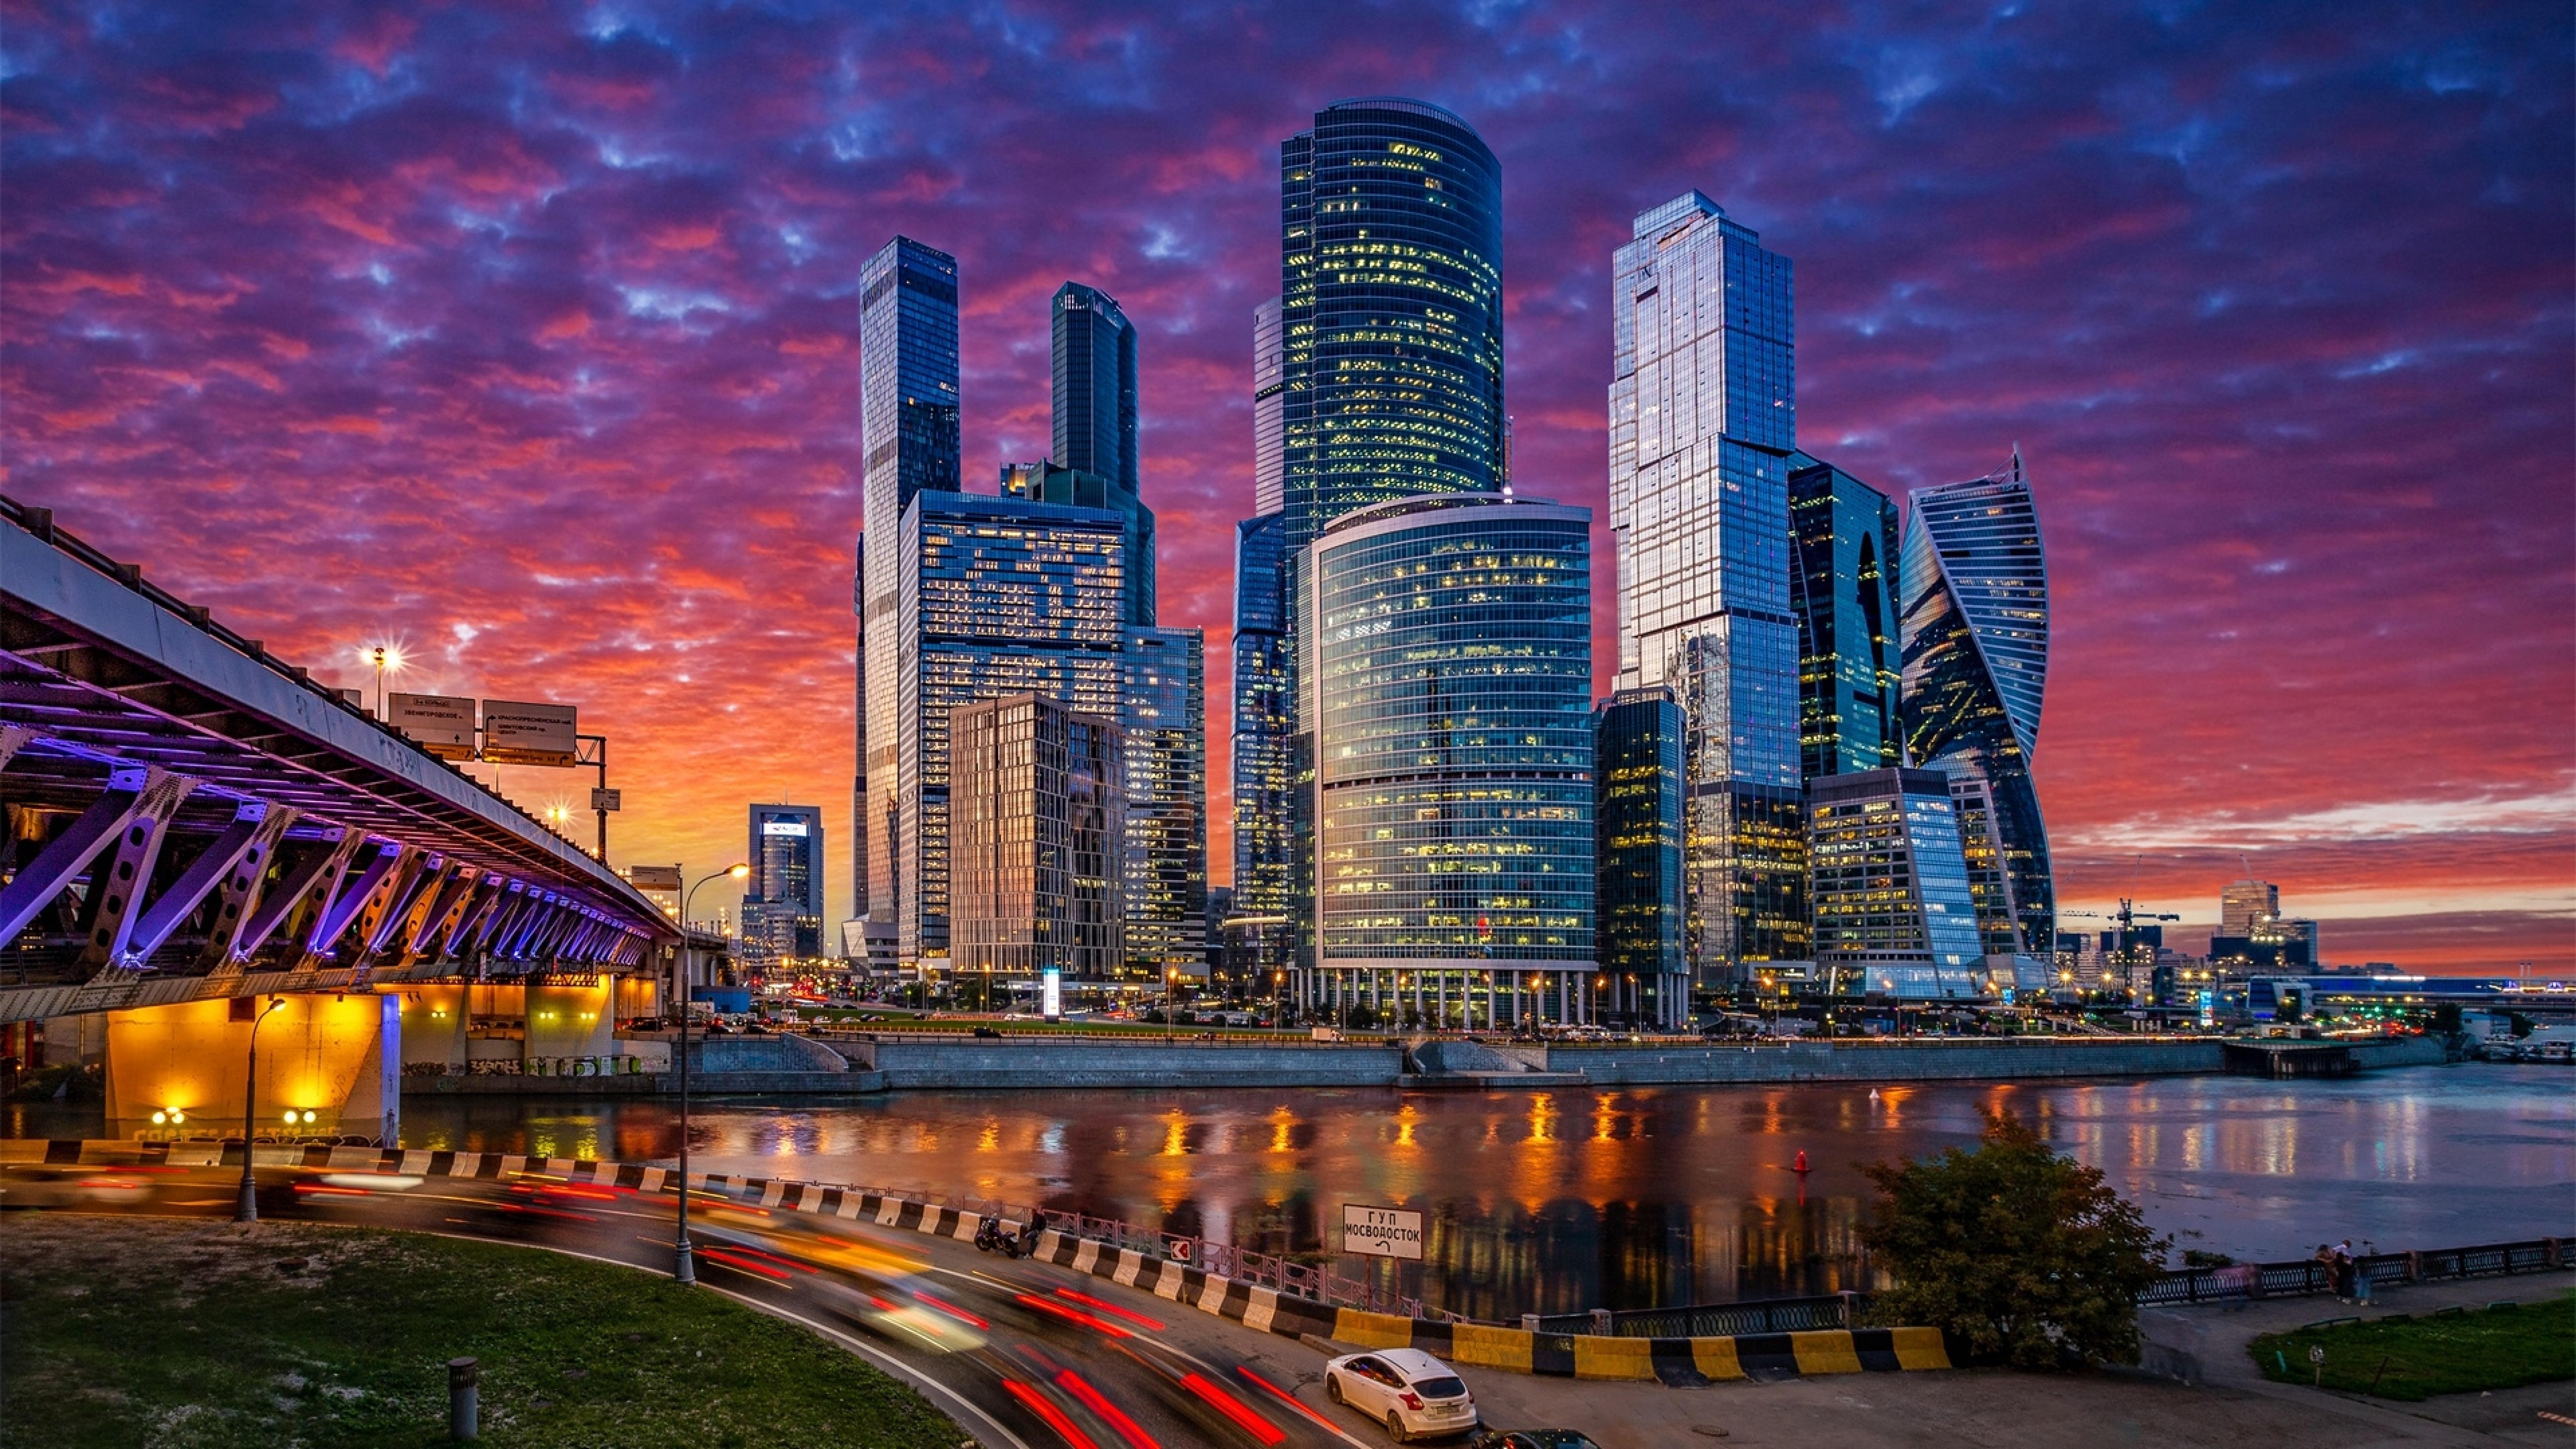 7680x4320 Moscow City At Night 8K Wallpaper, HD City 4K ...